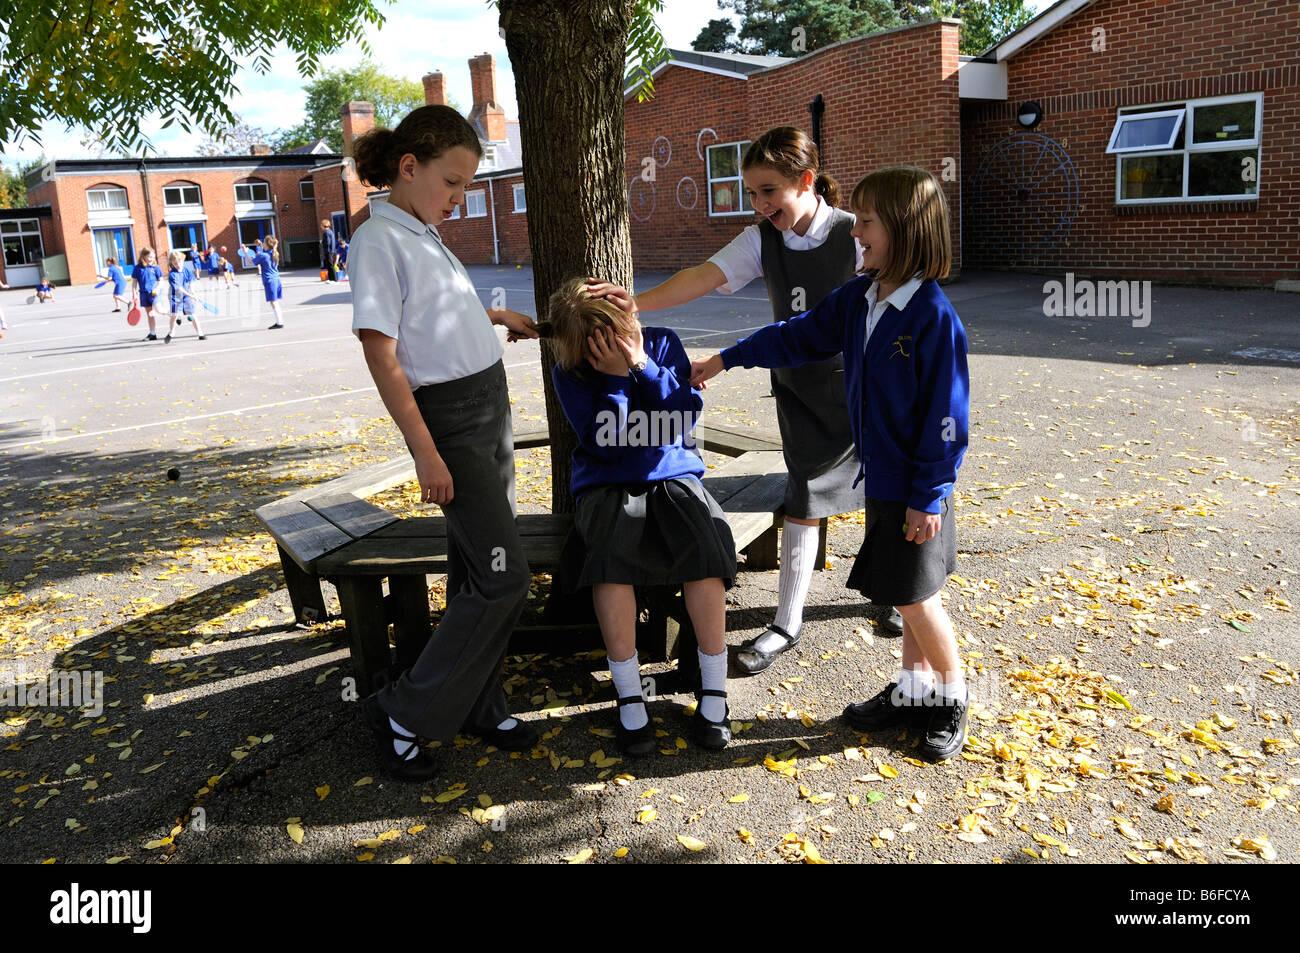 School playground schoolgirl being bullied by classmates - Stock Image